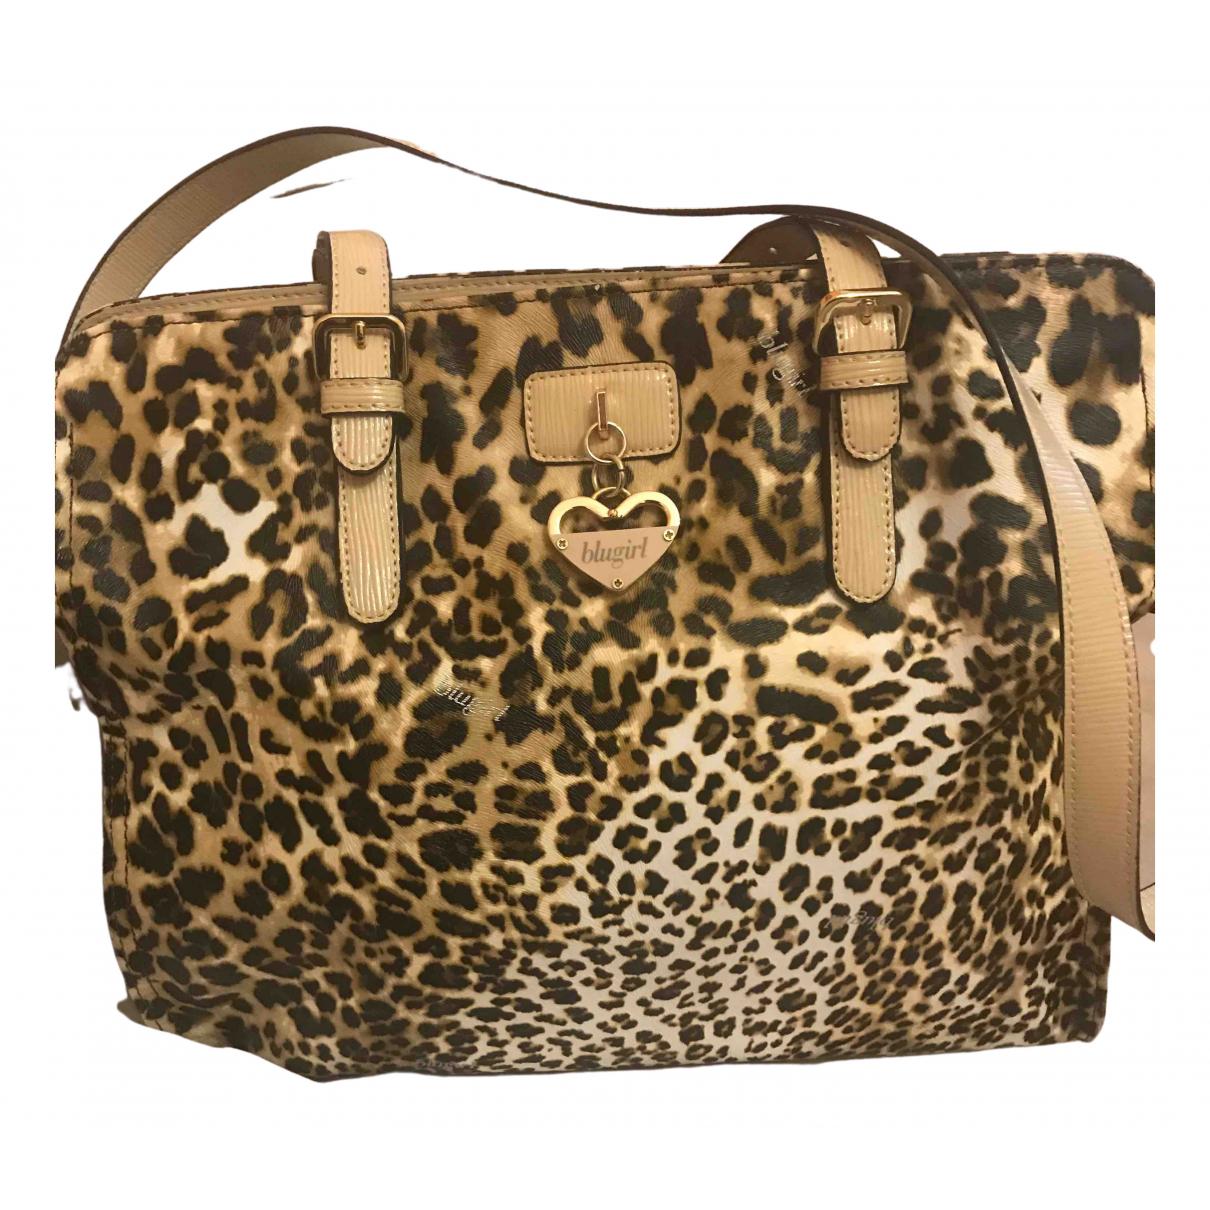 Blumarine N Brown handbag for Women N